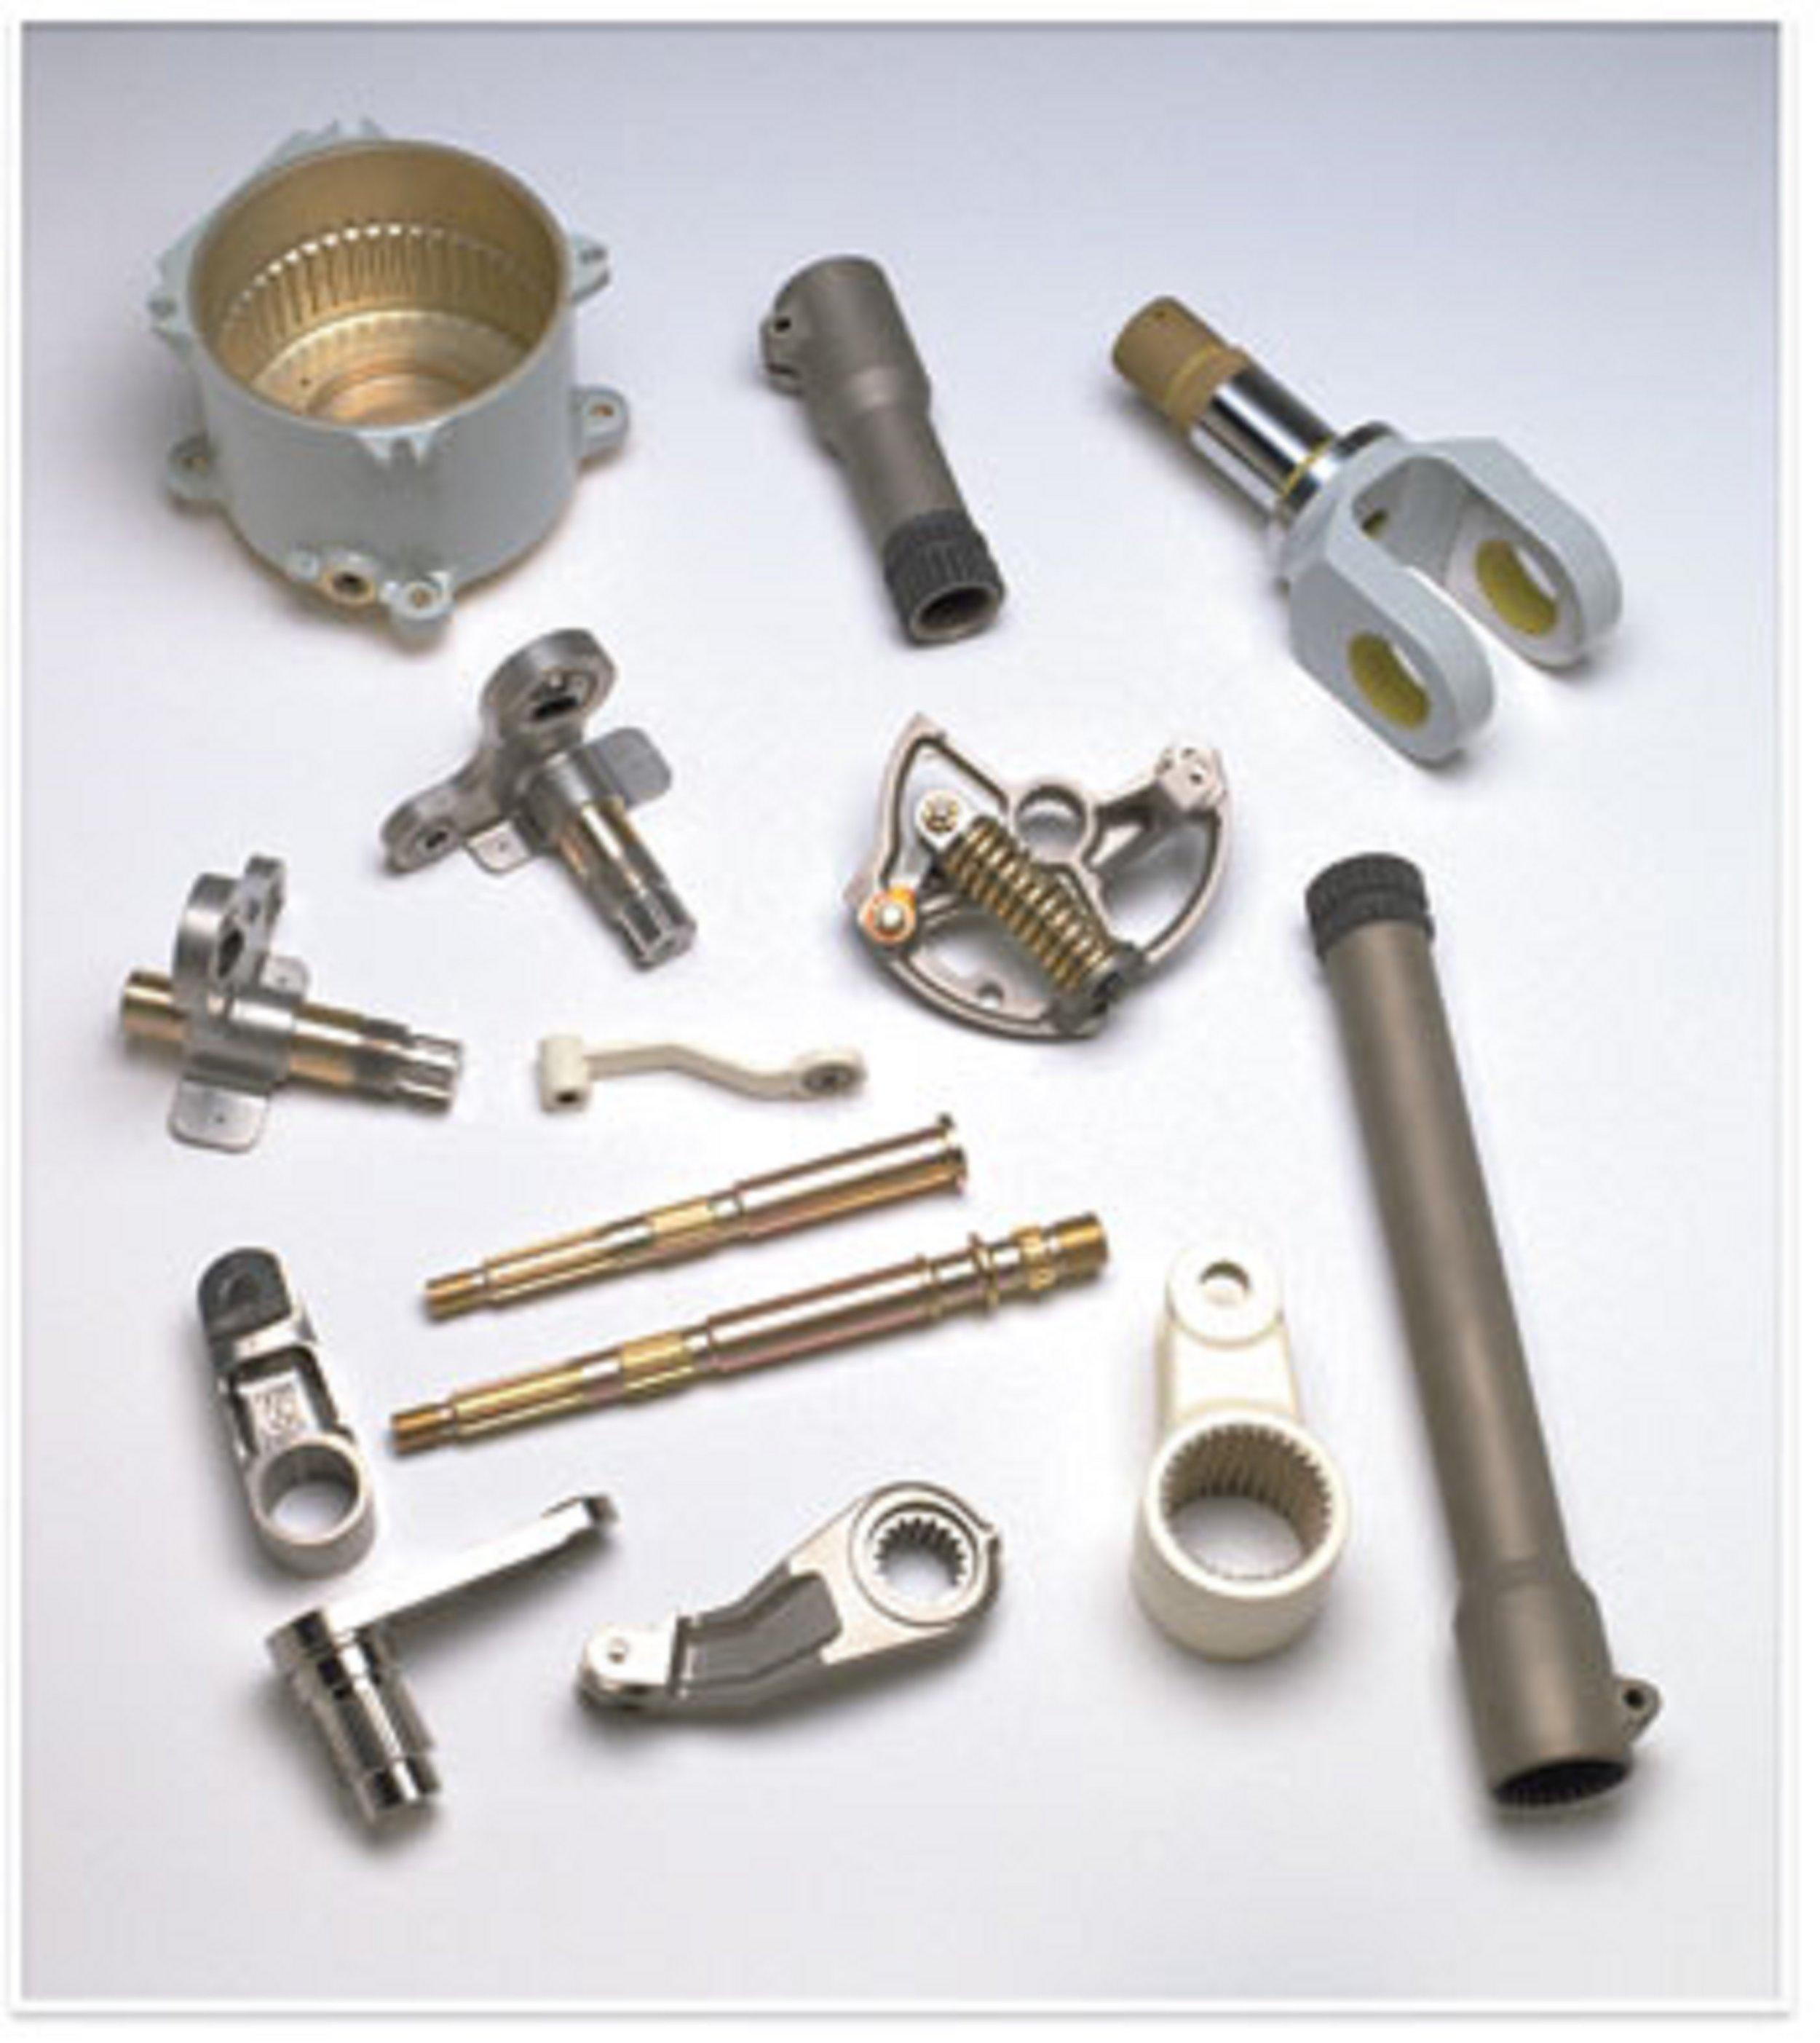 Internal and External Splined Parts